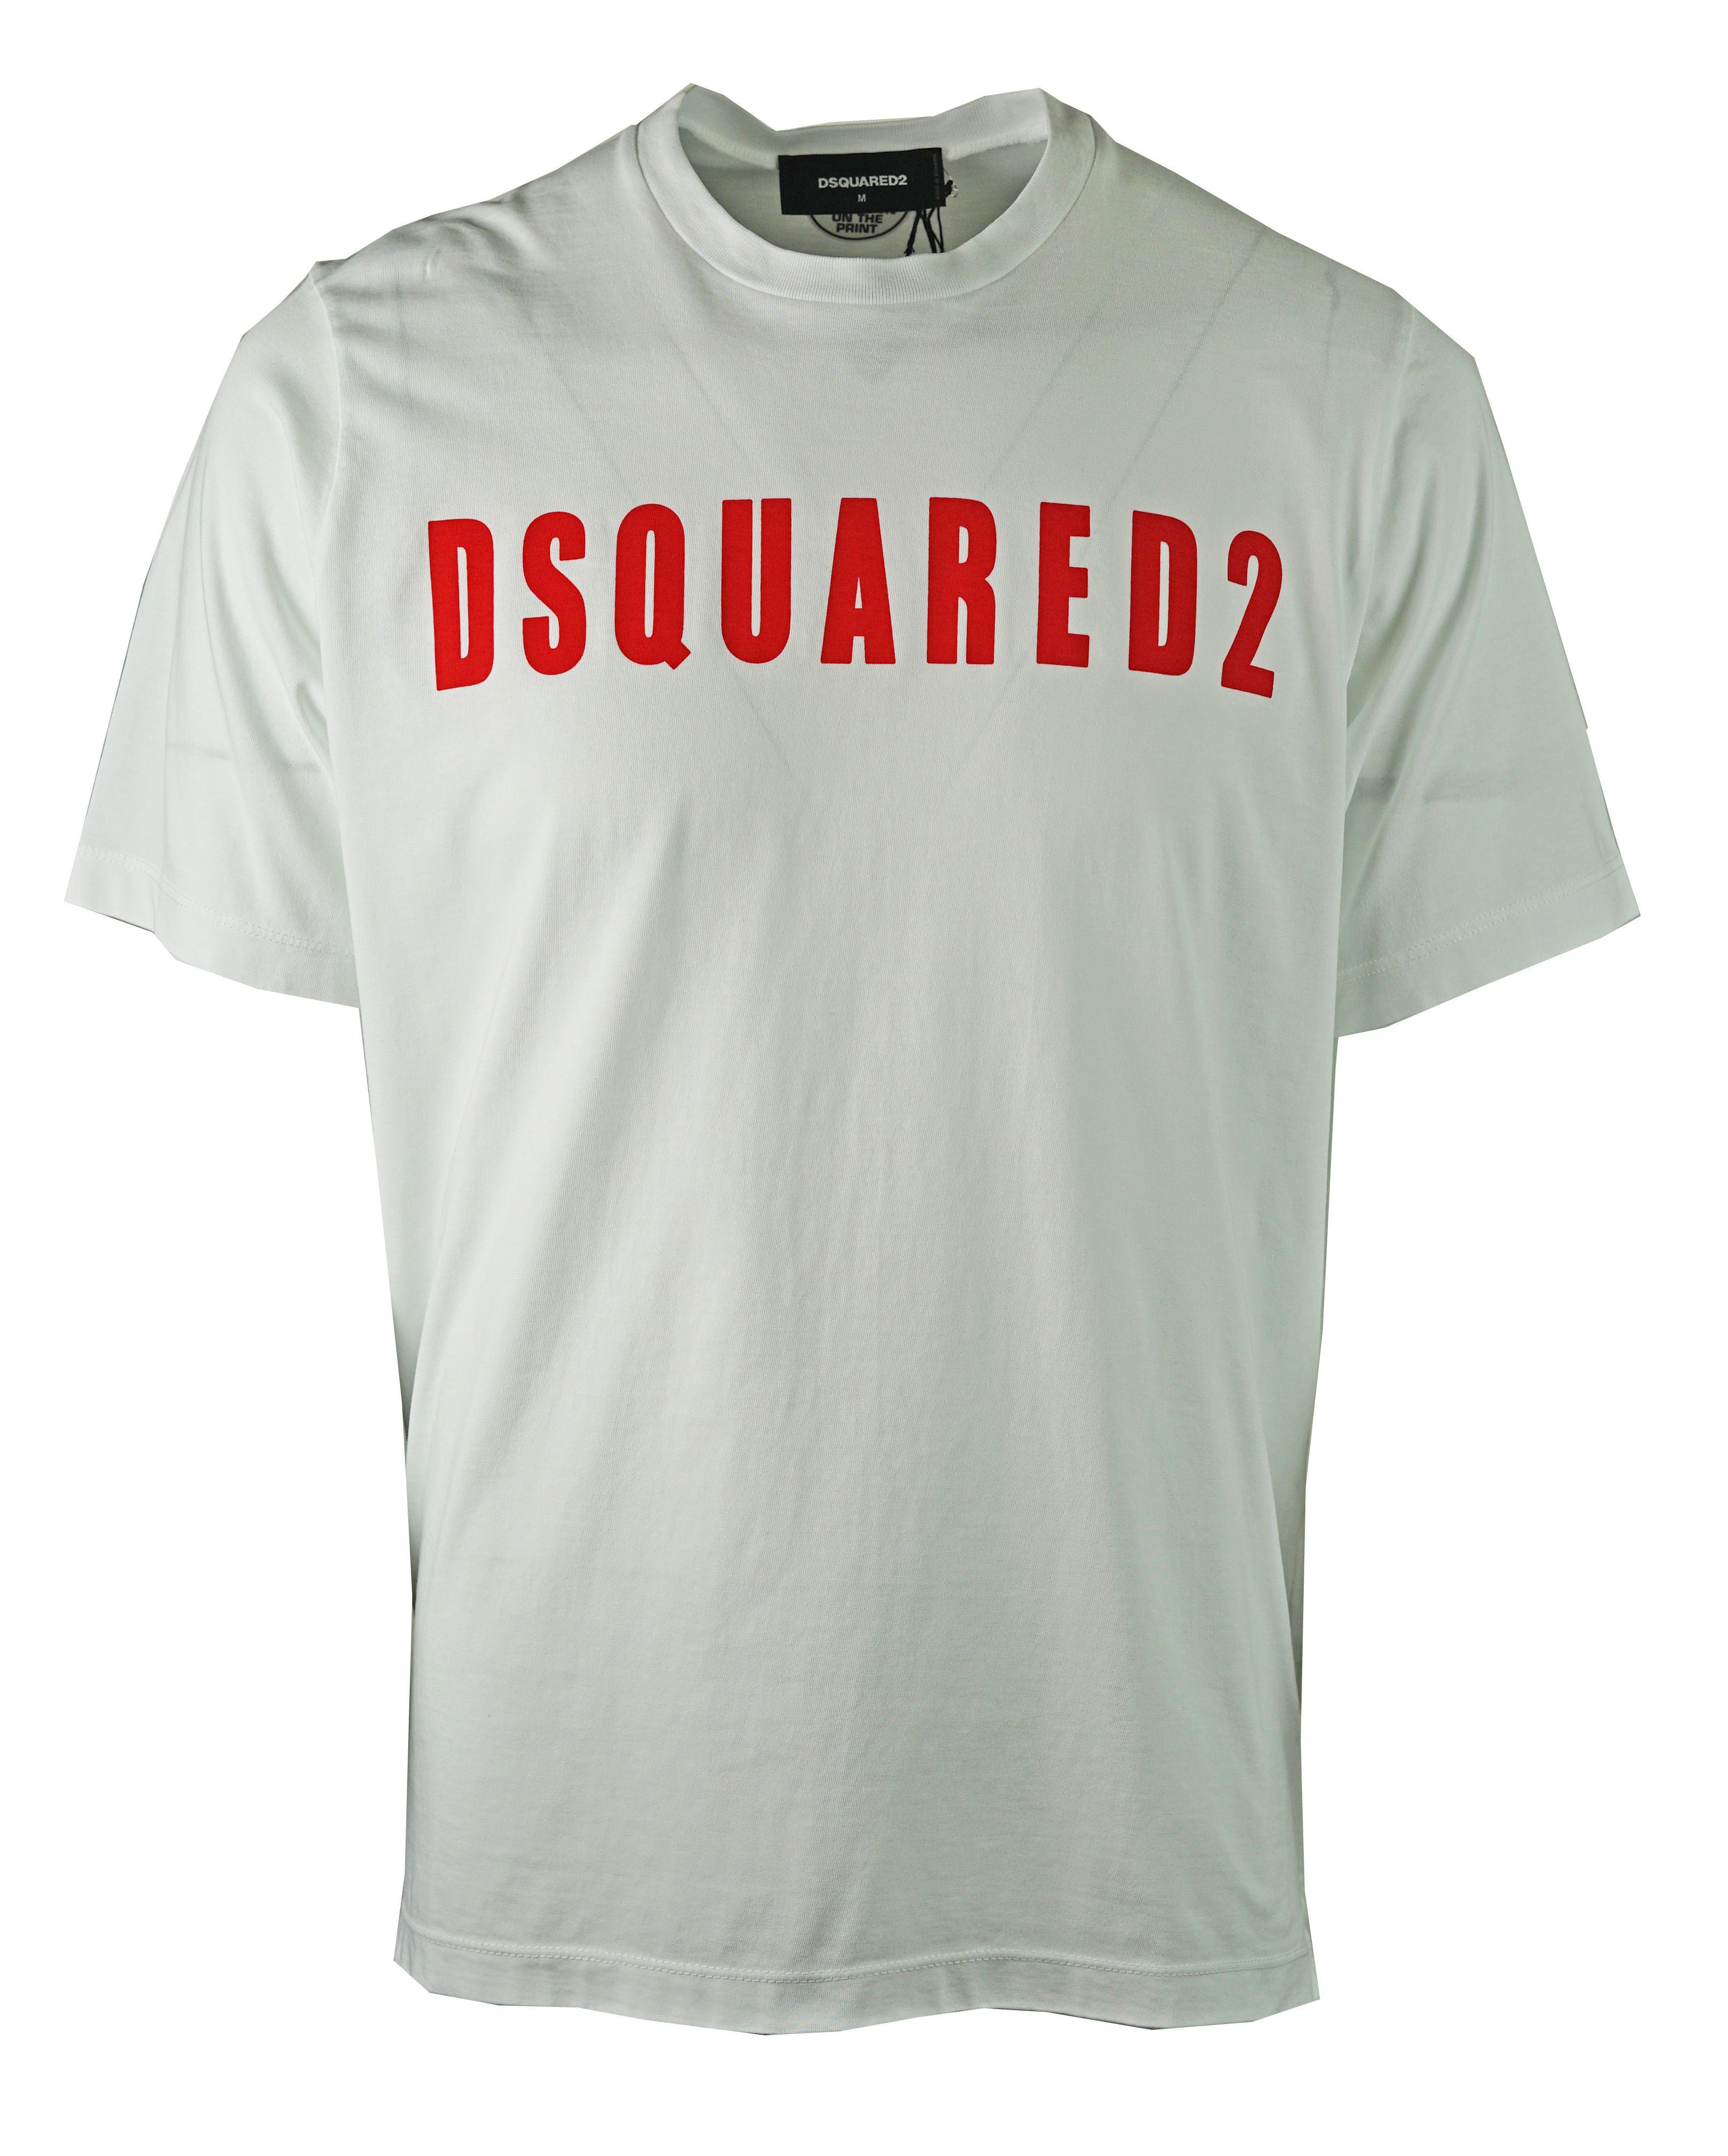 DSquared2 S74GD0472 S20694 100 T-Shirt